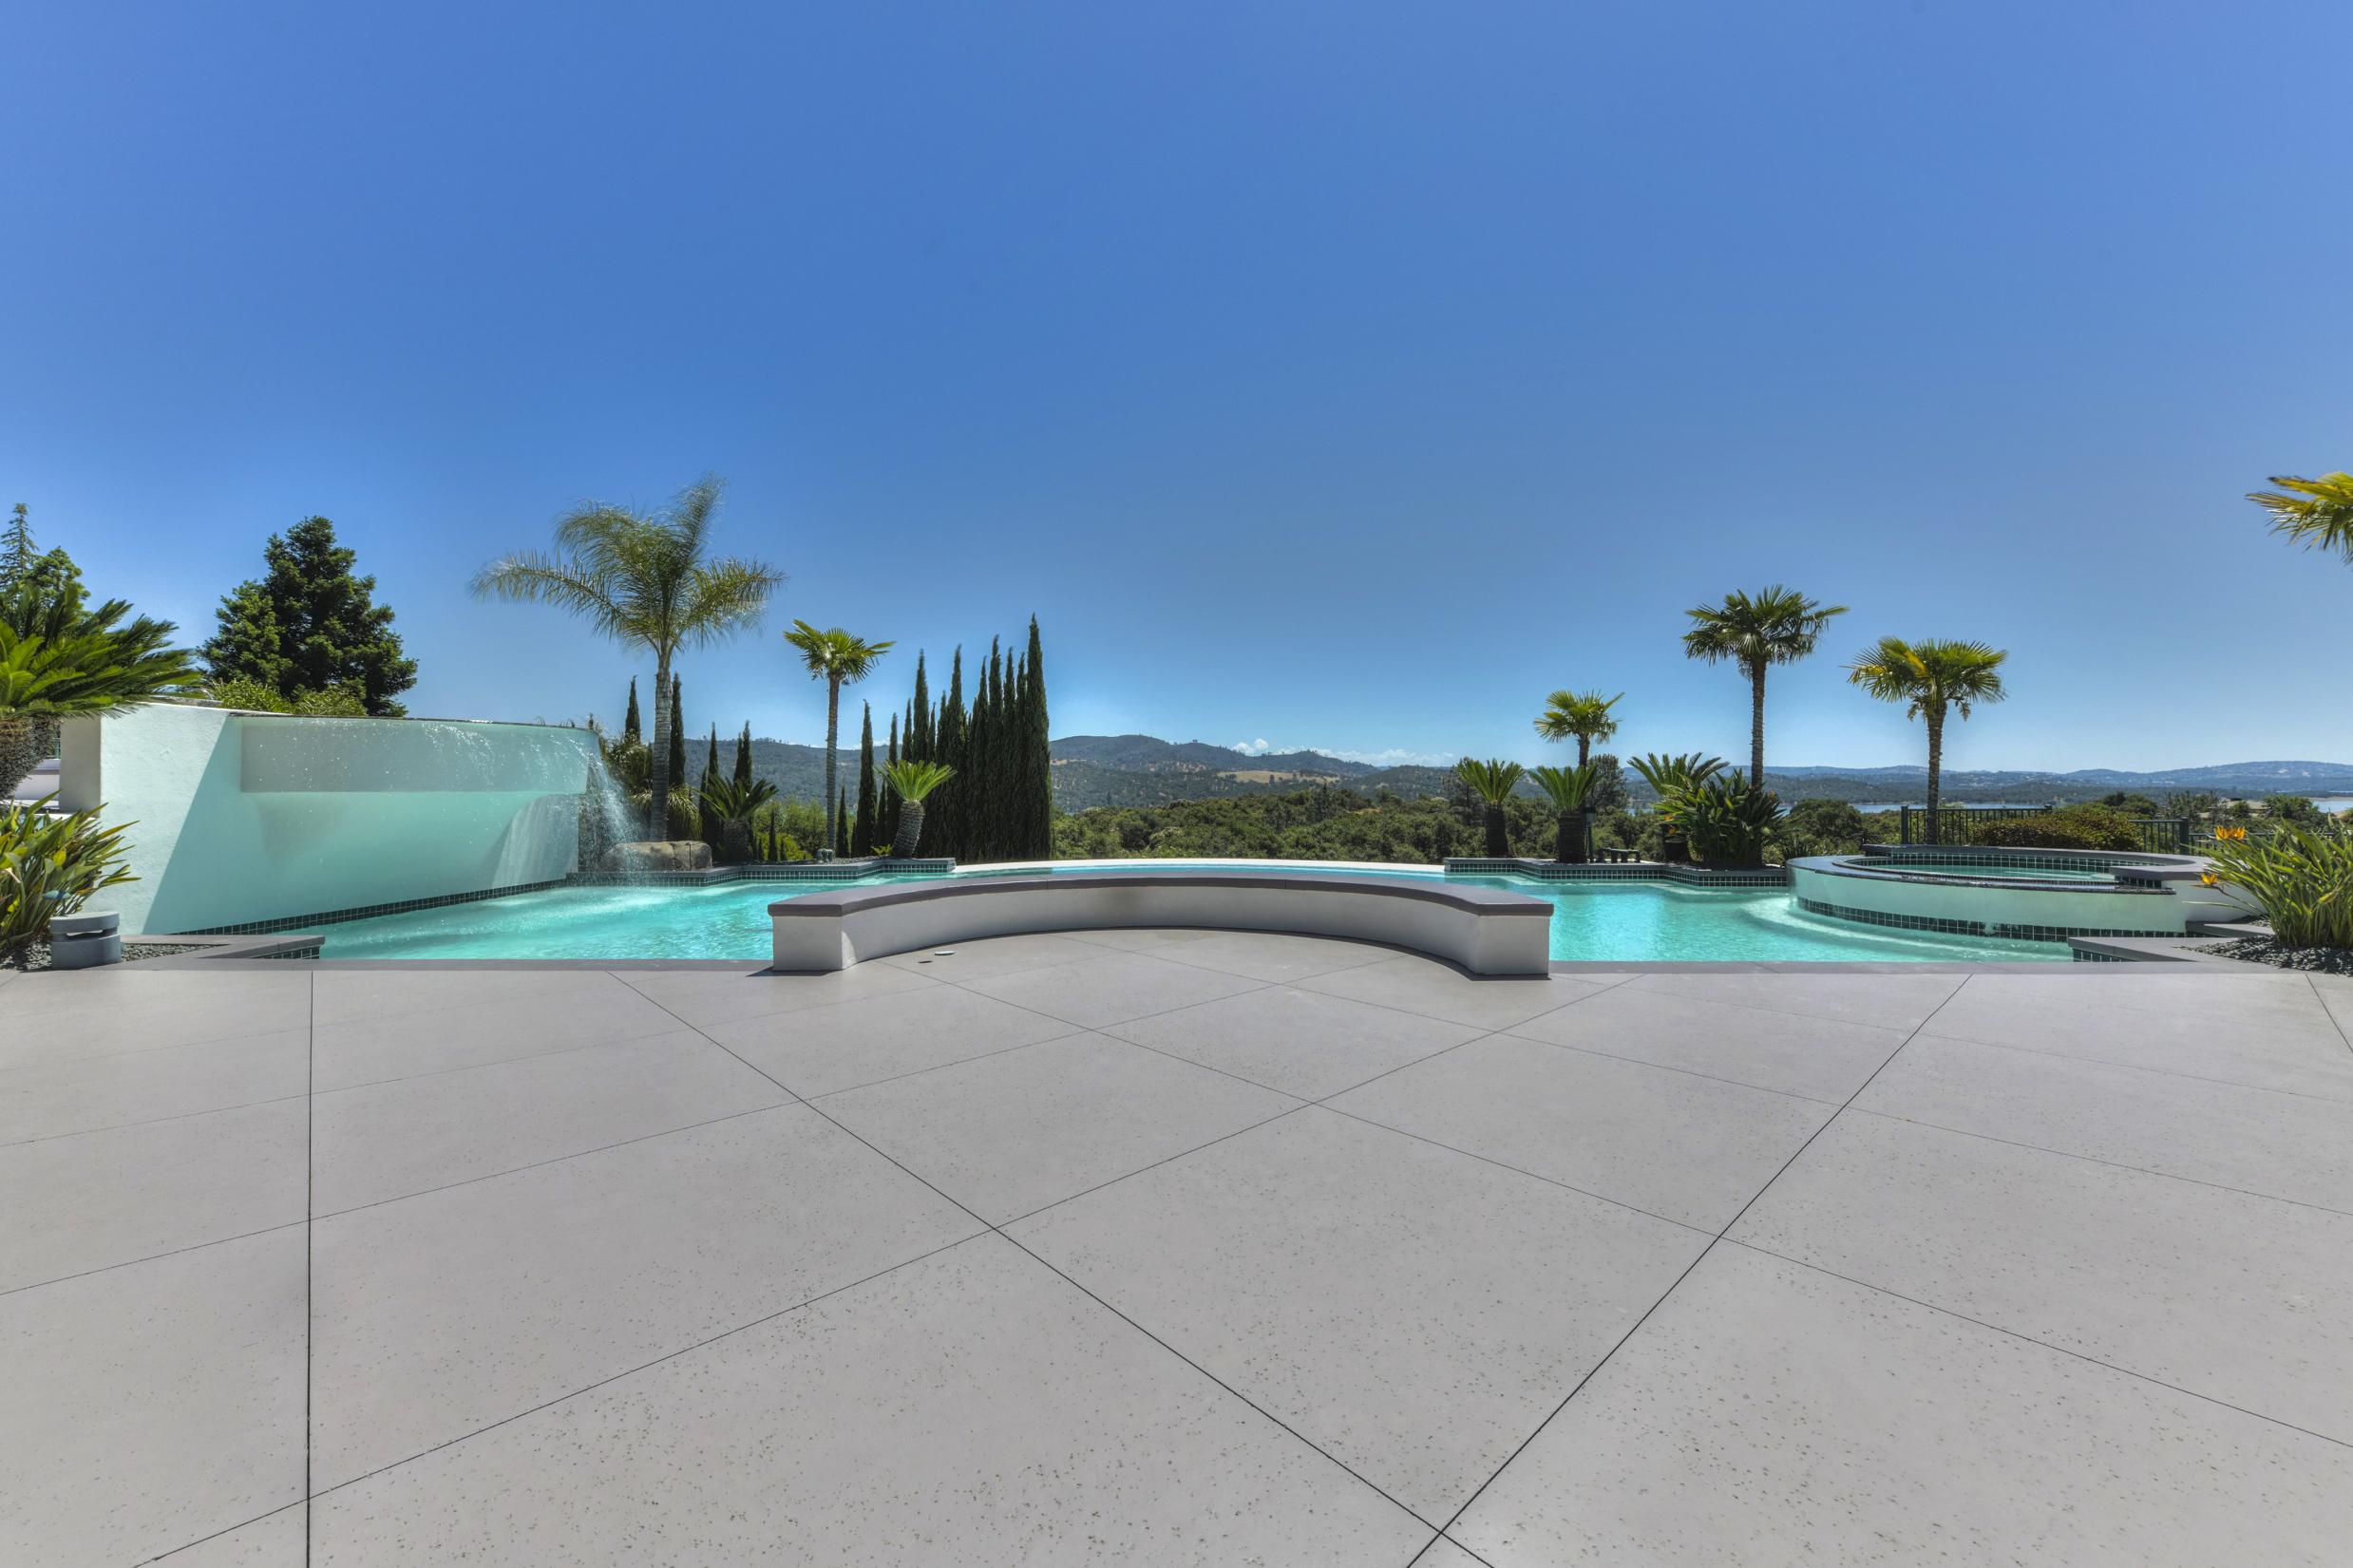 9125 Vista De Lago - Exterior with Pool 21.jpg